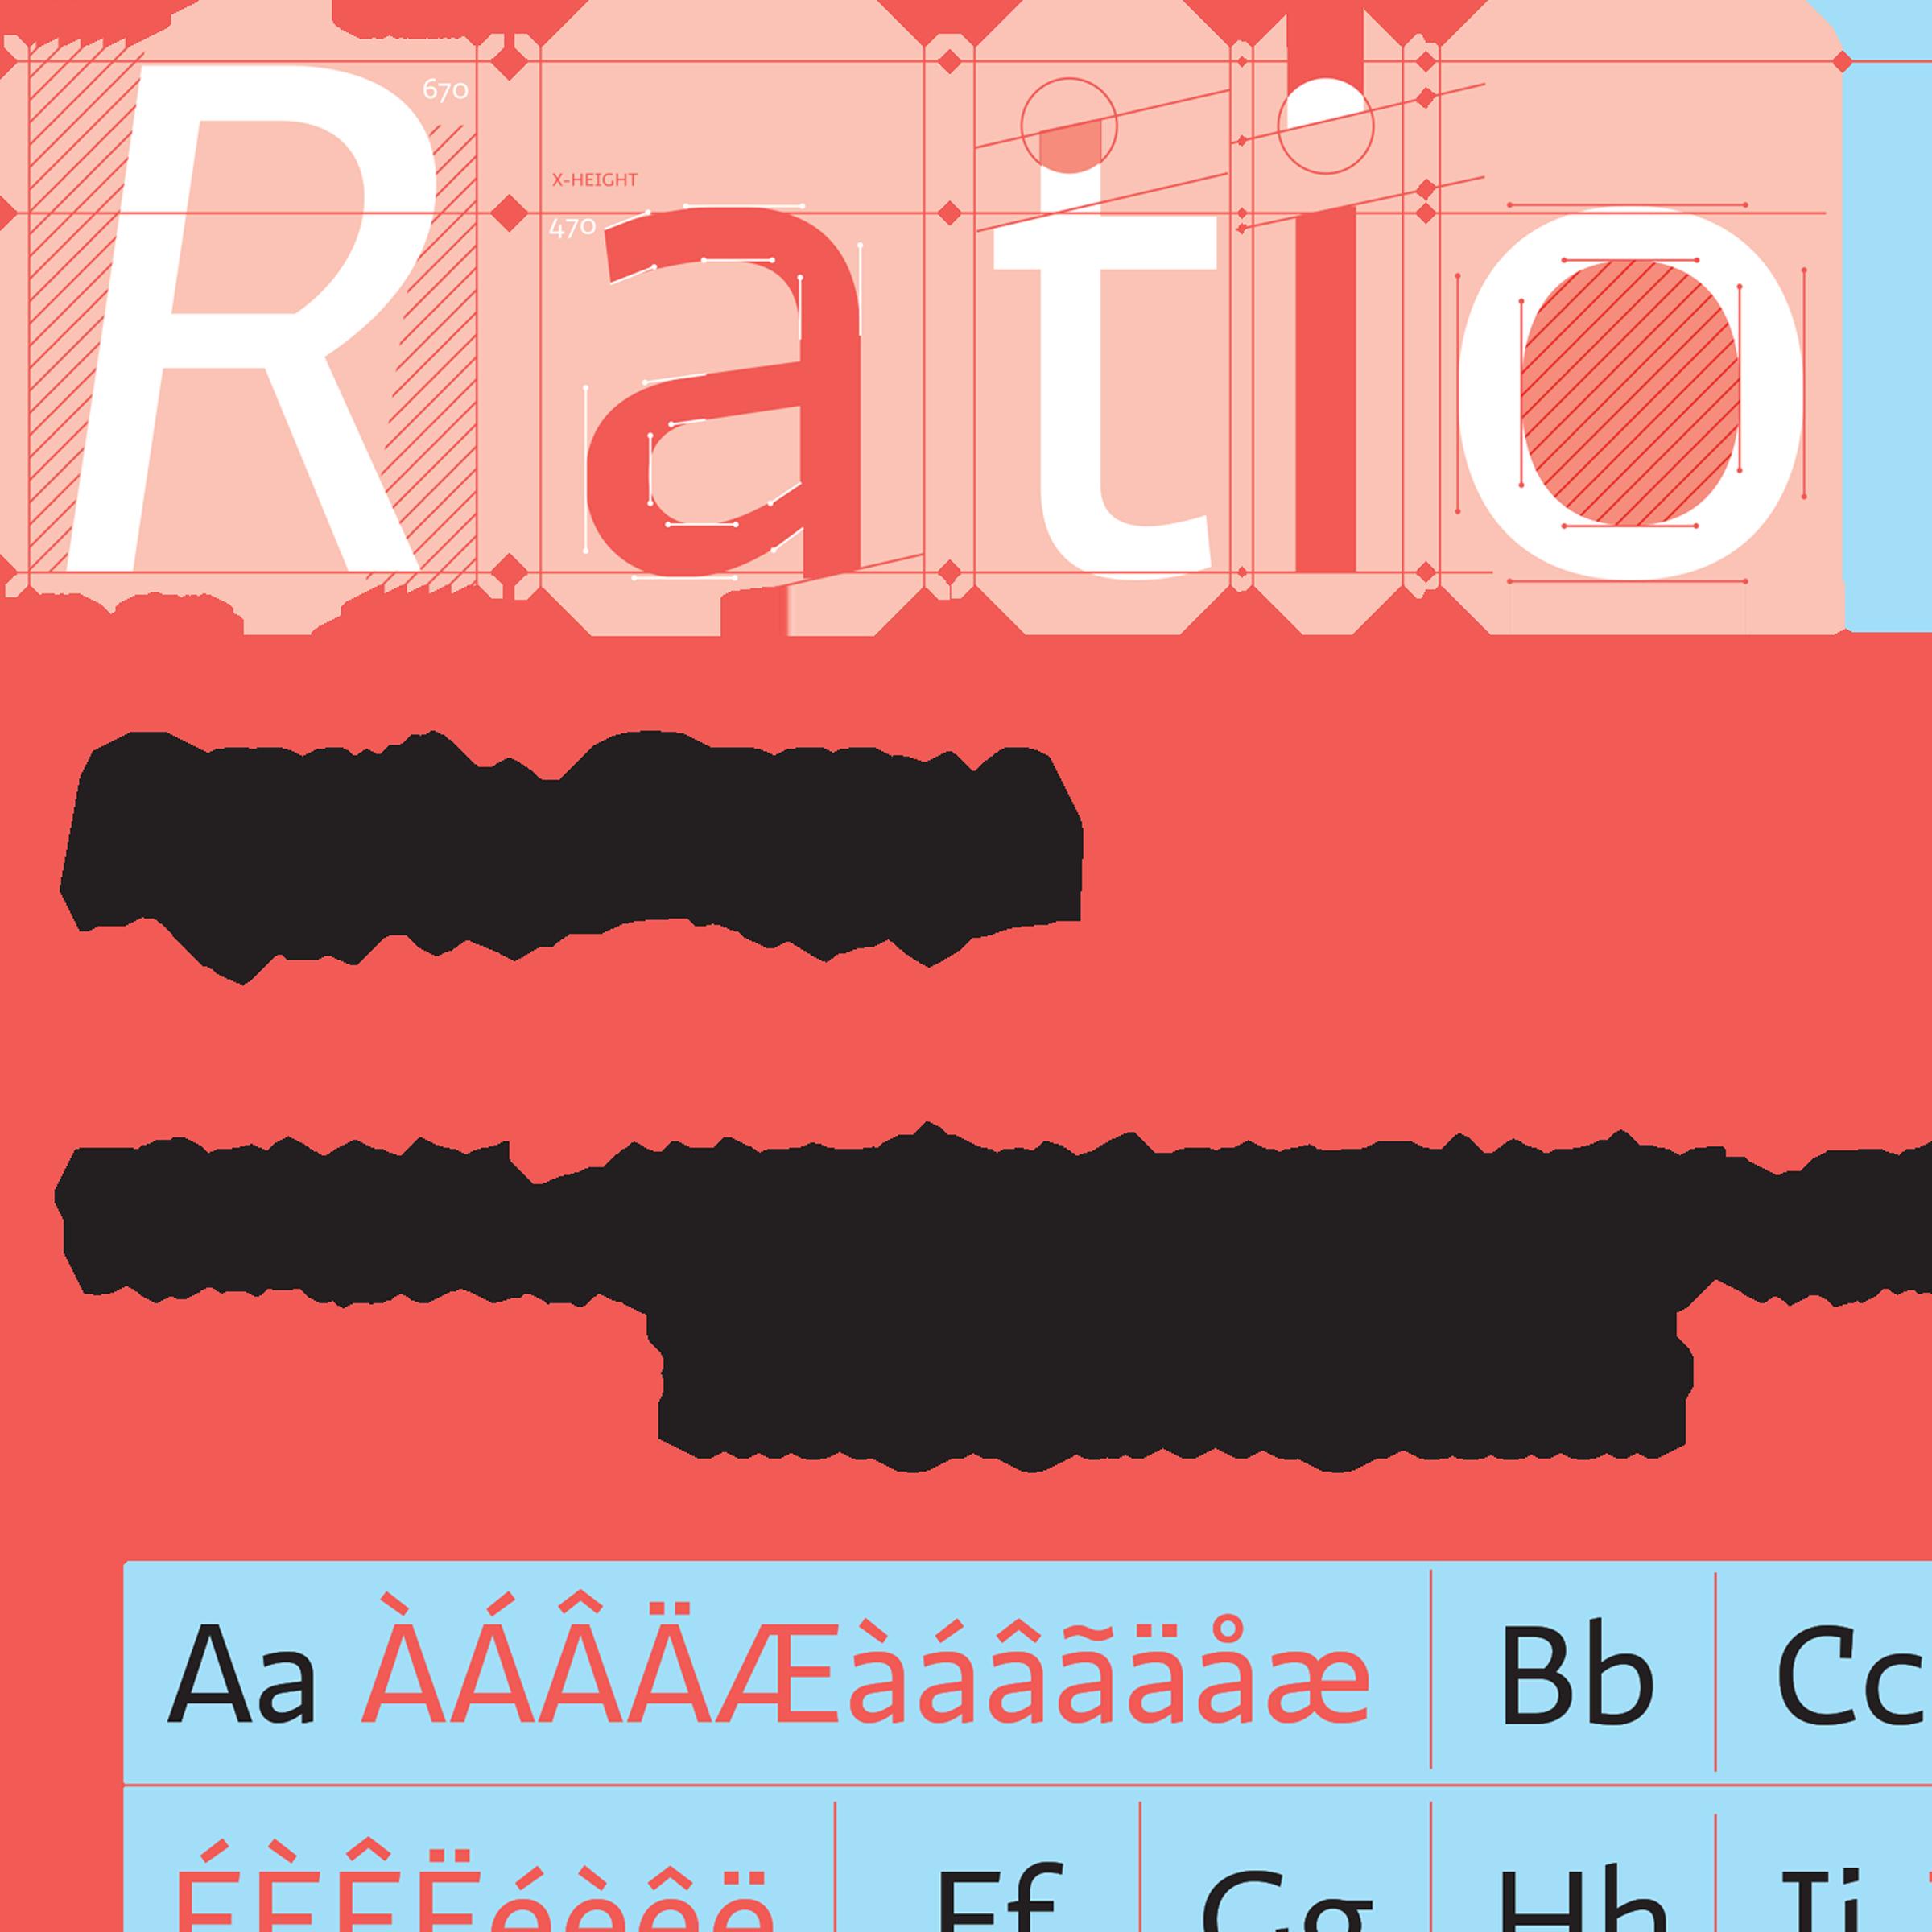 Ratio_showcase.png